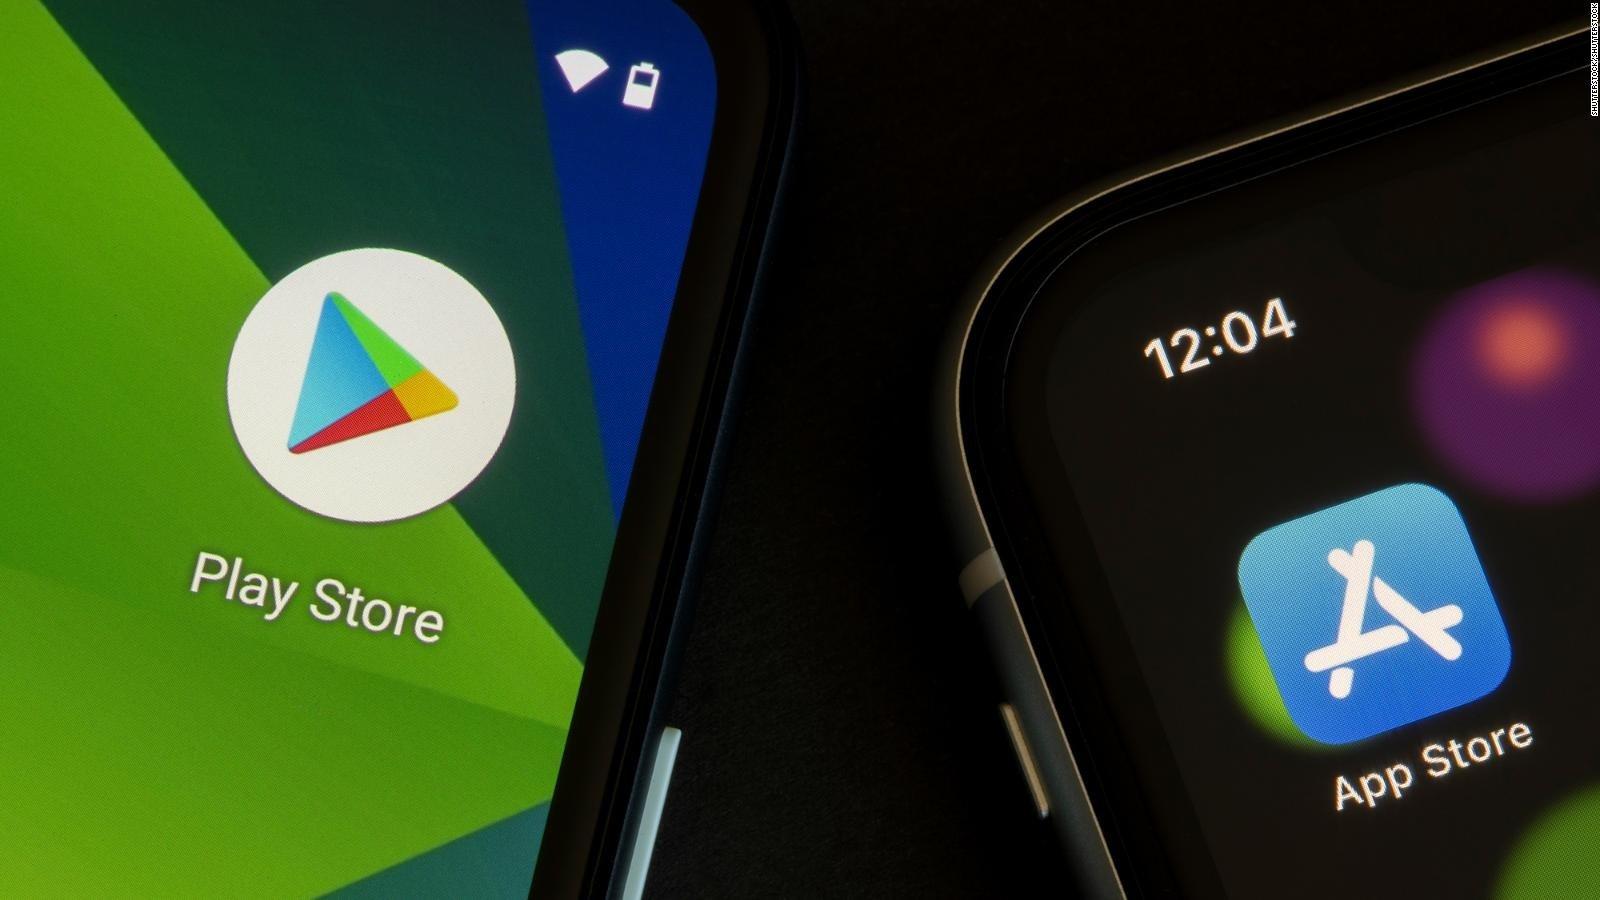 Magasins d'applications Google et Apple